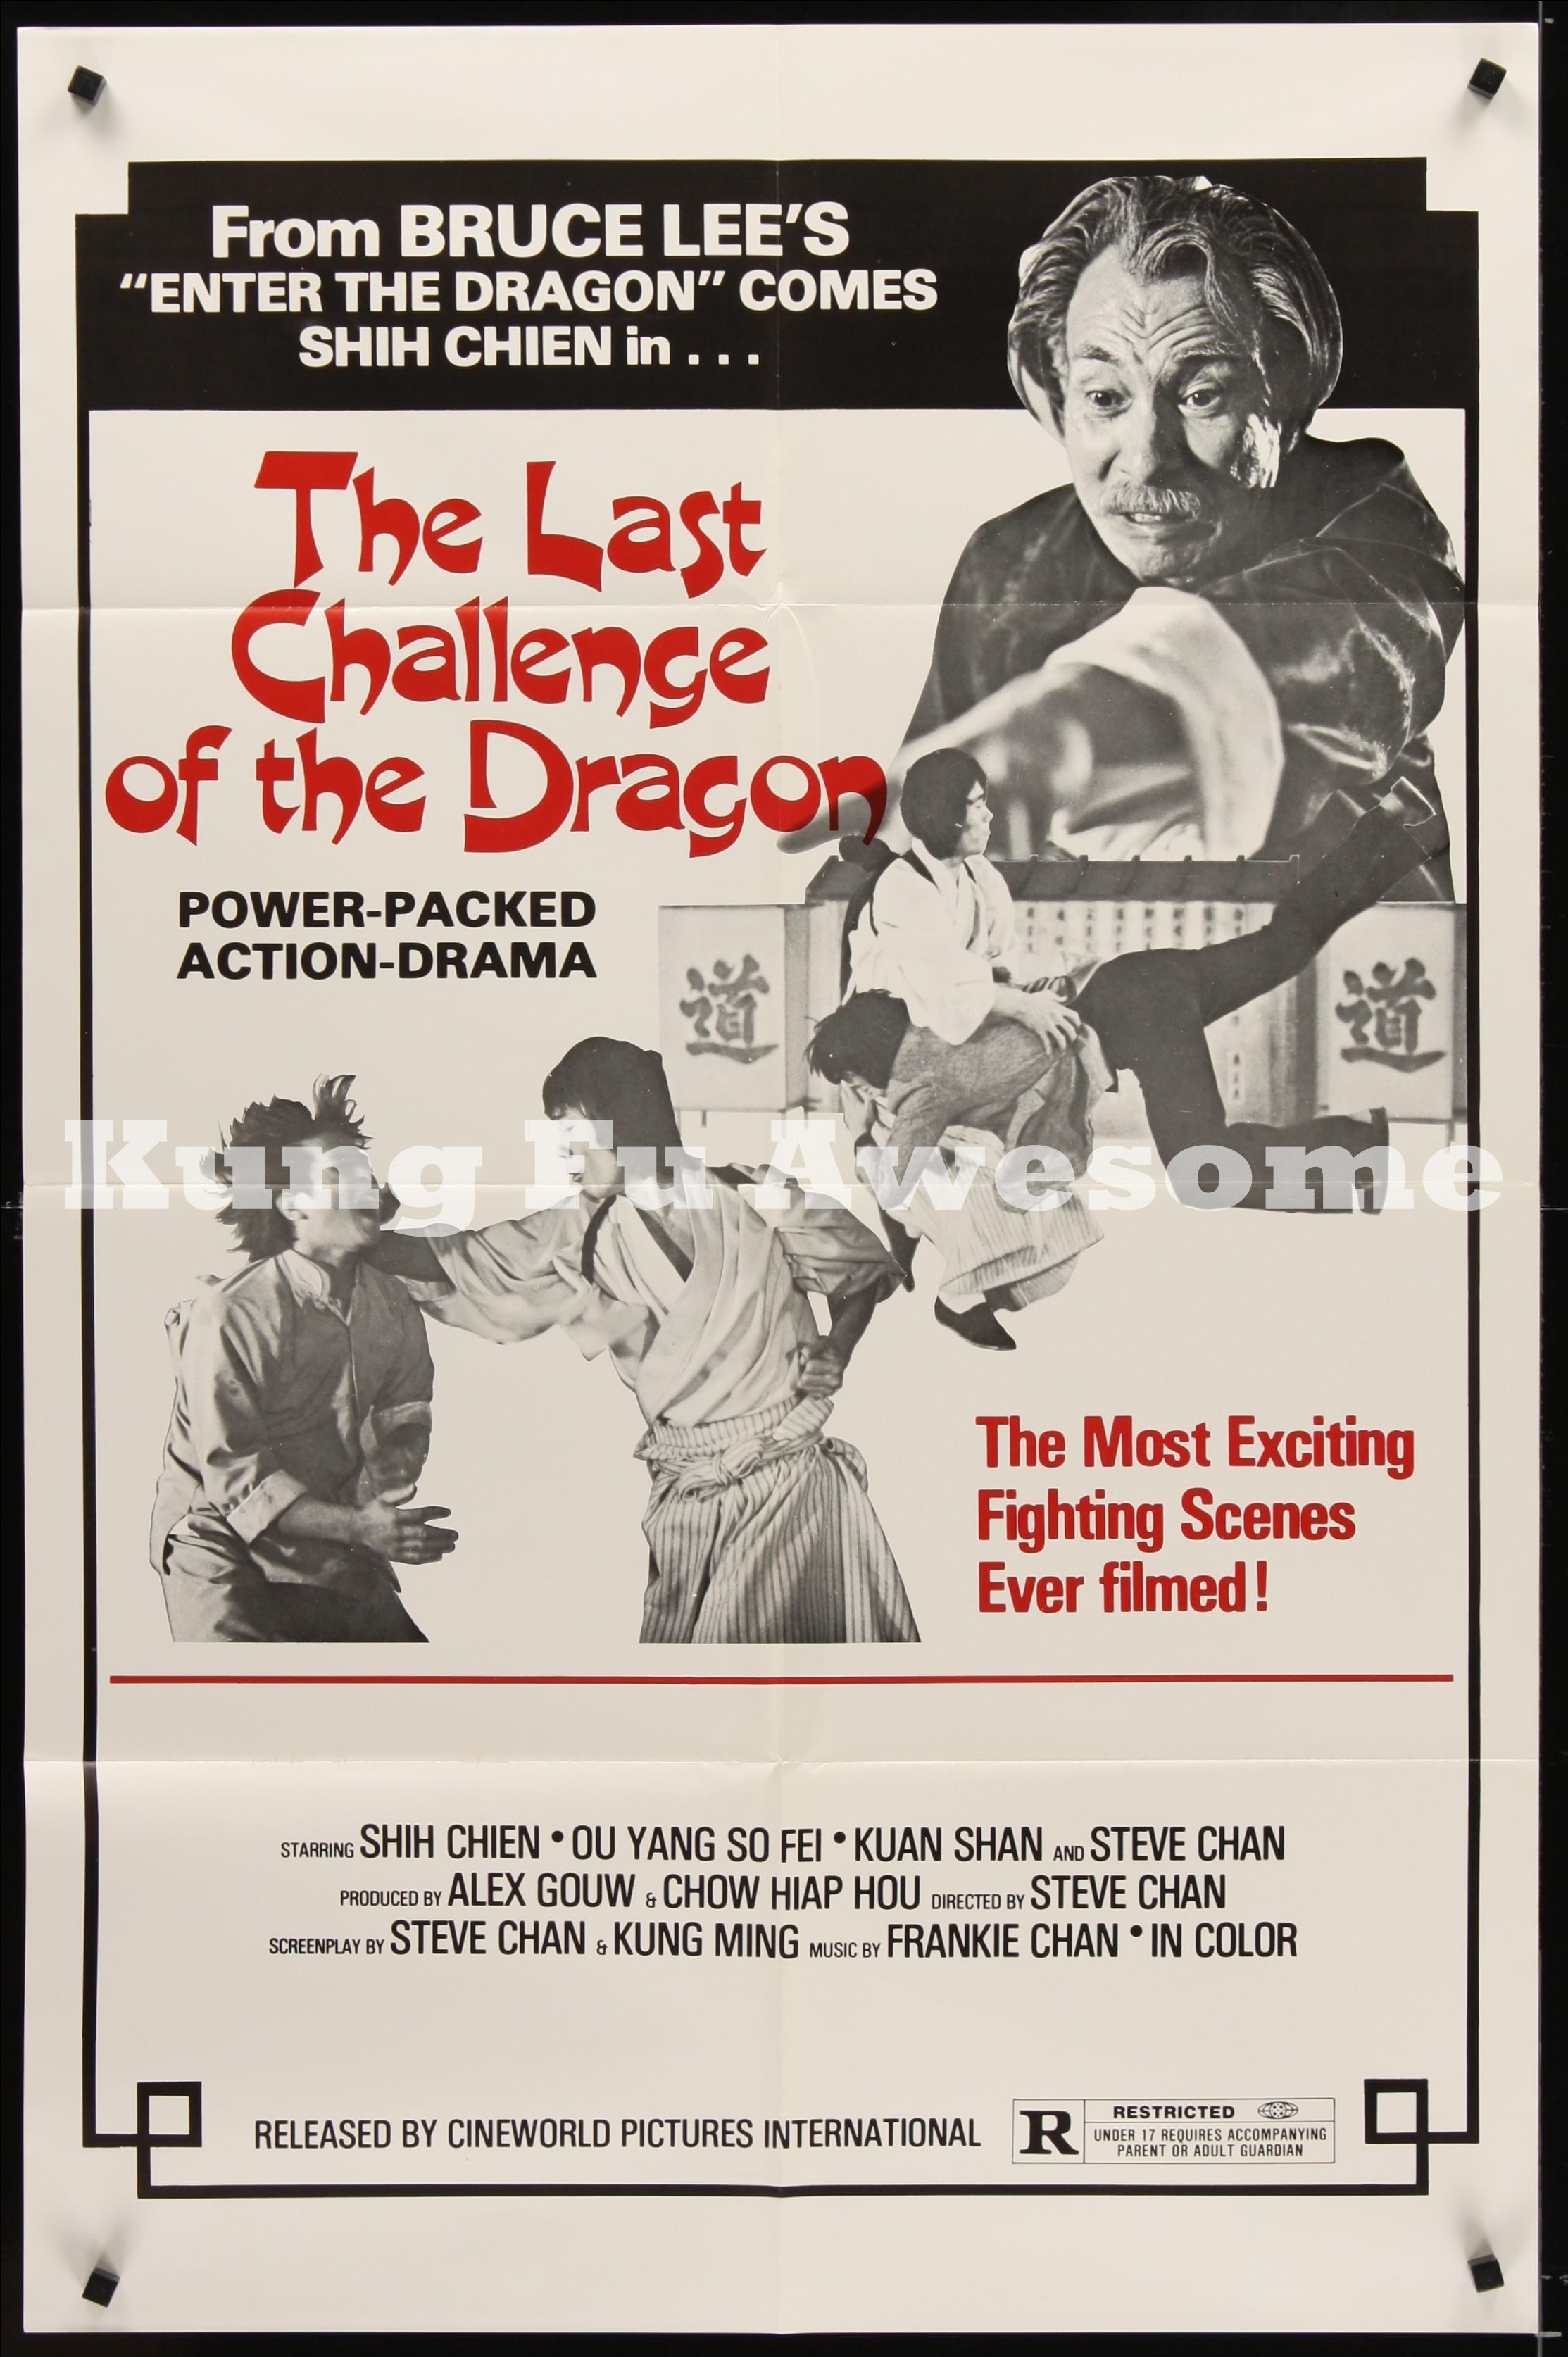 last_challenge_of_the_dragon_JC03135_L.jpg